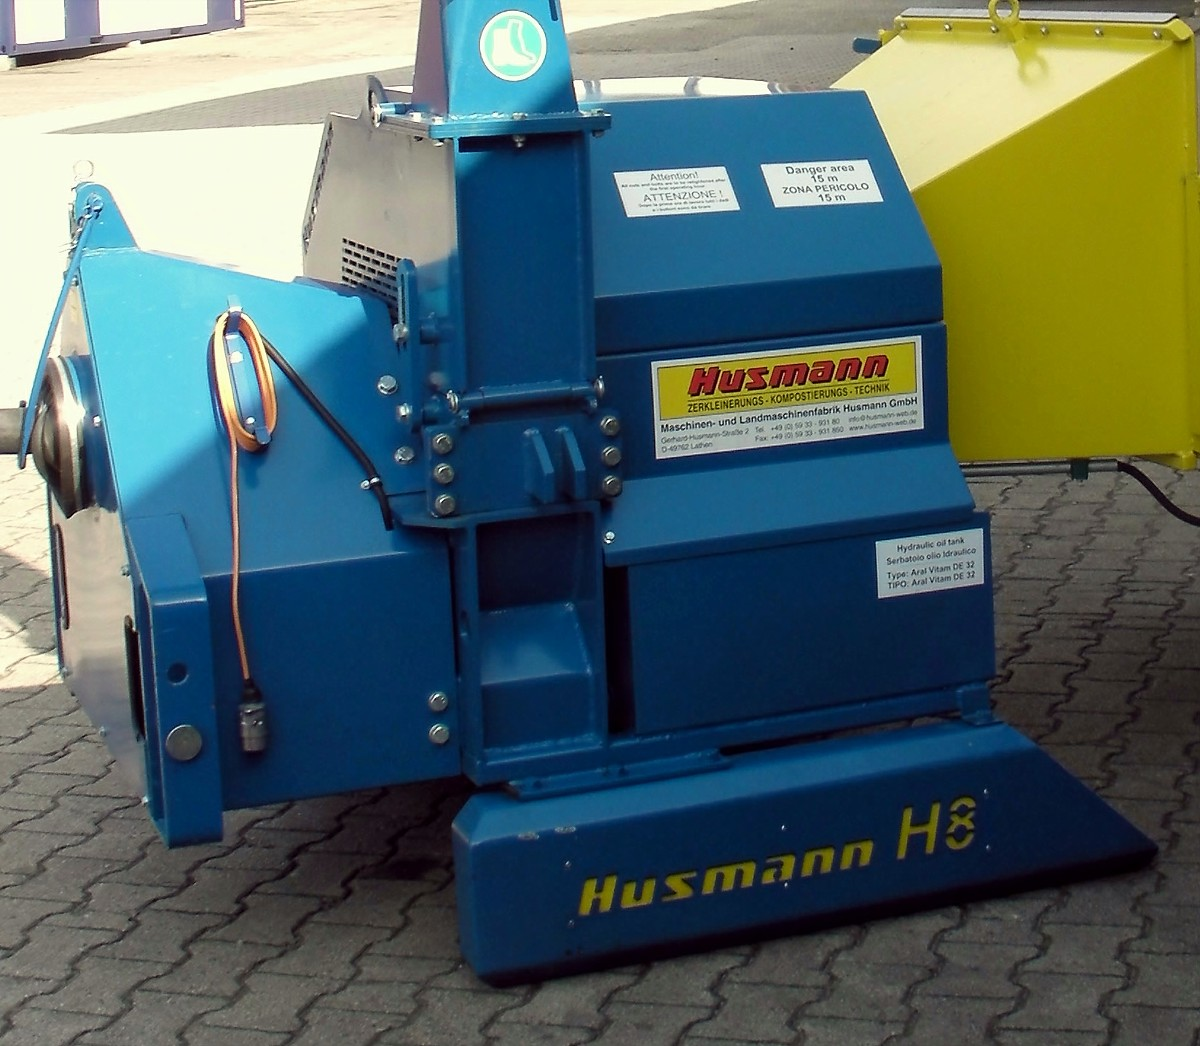 Husmann H8 (4)